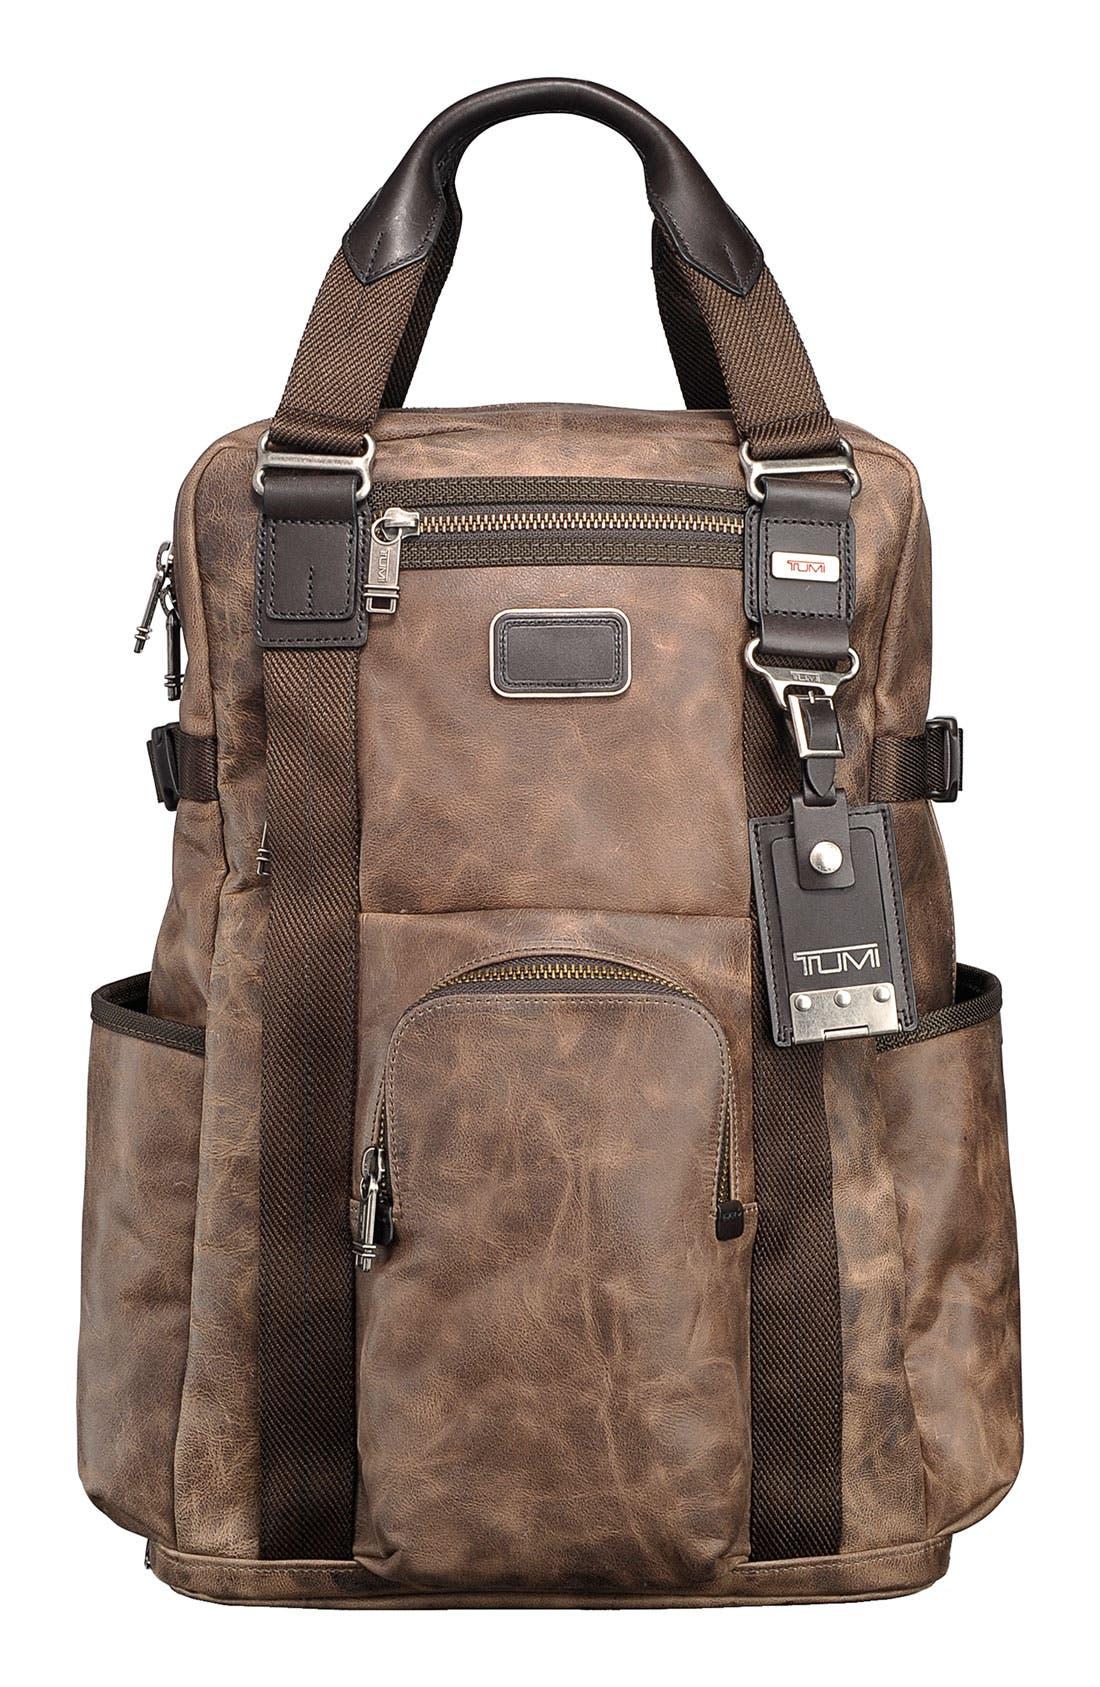 Main Image - Tumi 'Bravo - Lejune' Backpack Tote